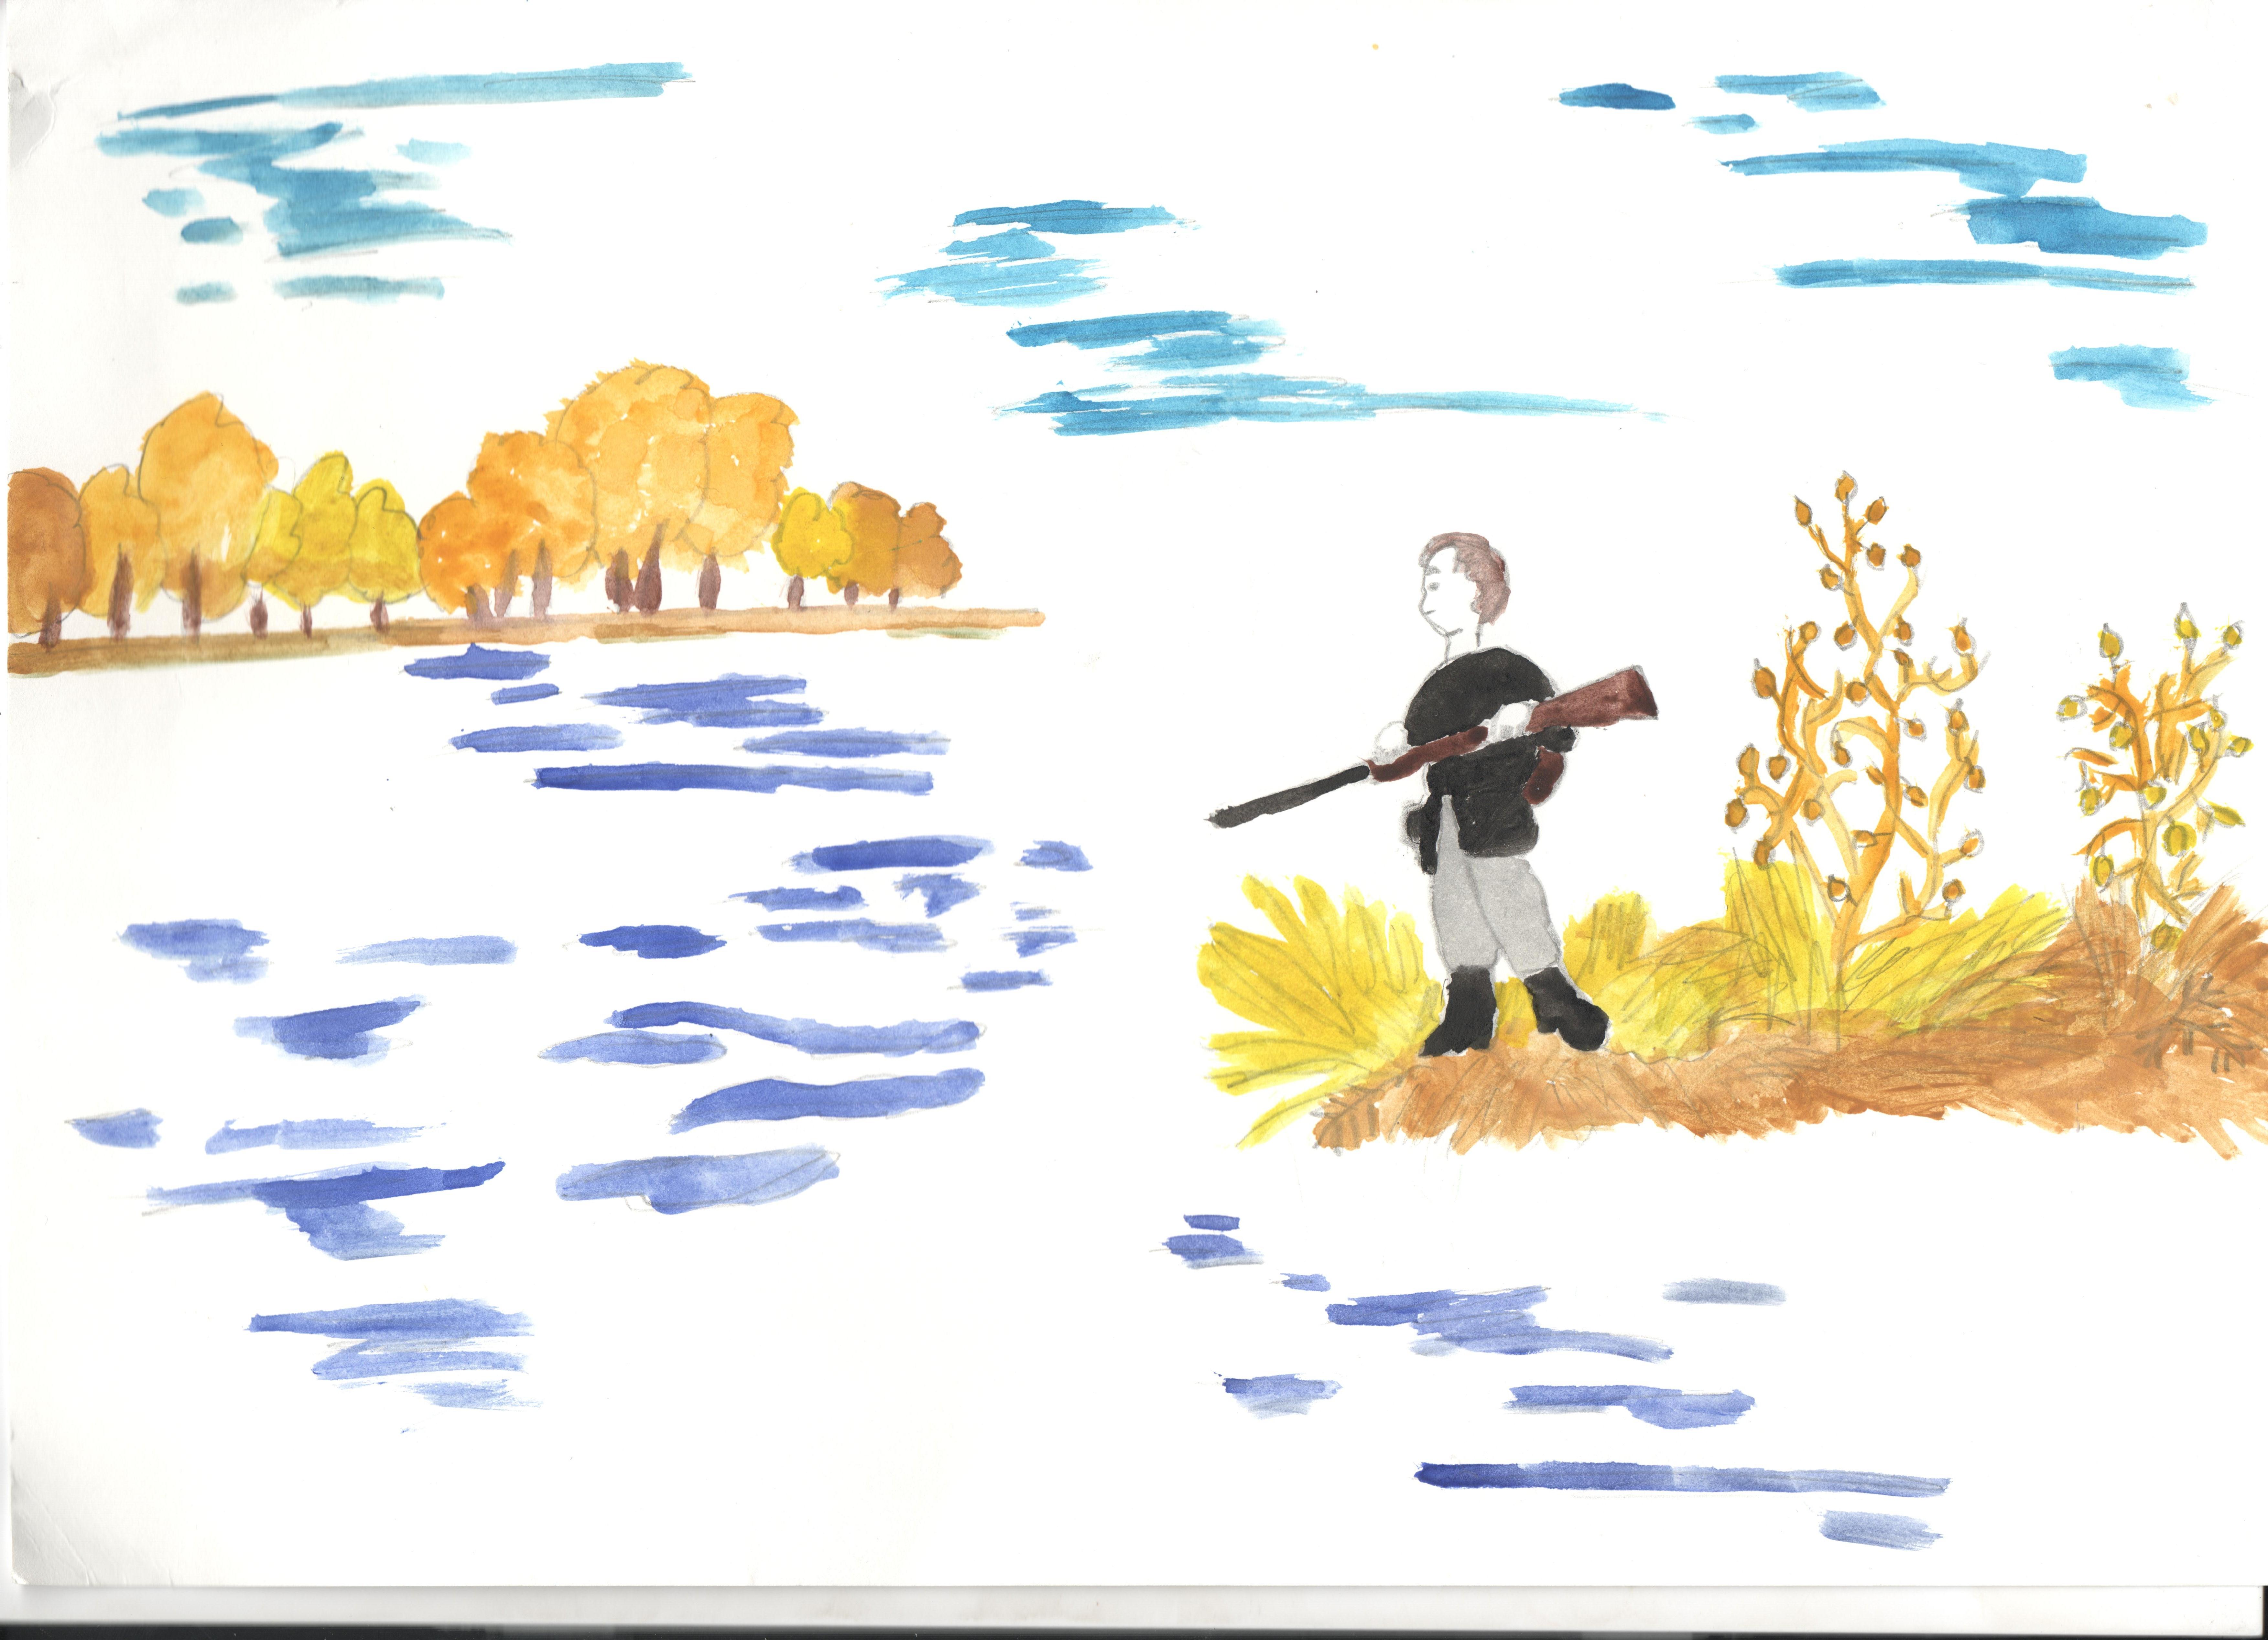 Картинки раскраски по рассказу васюткино озеро